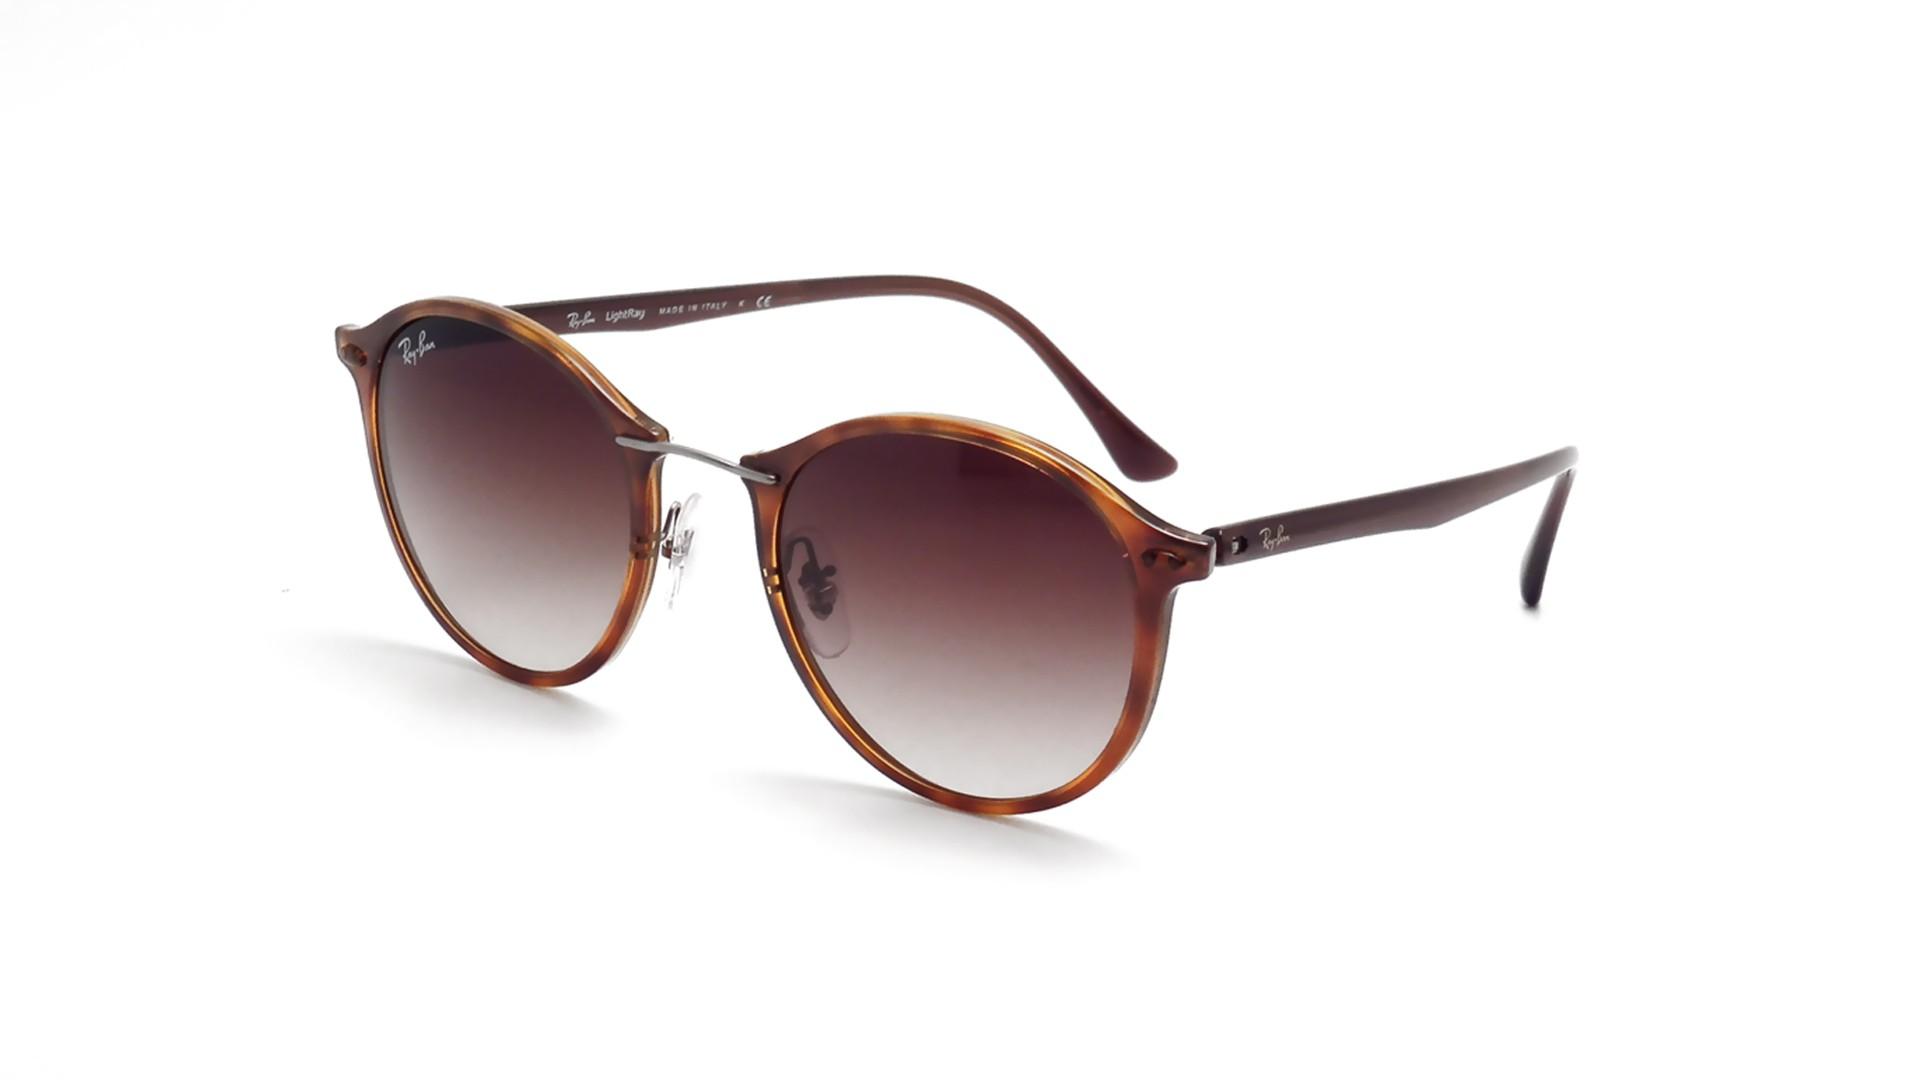 c531de3c69 Sunglasses Ray-Ban Tech Light Ray Havane Tech Tortoise RB4242 620113 49-21  Medium Gradient